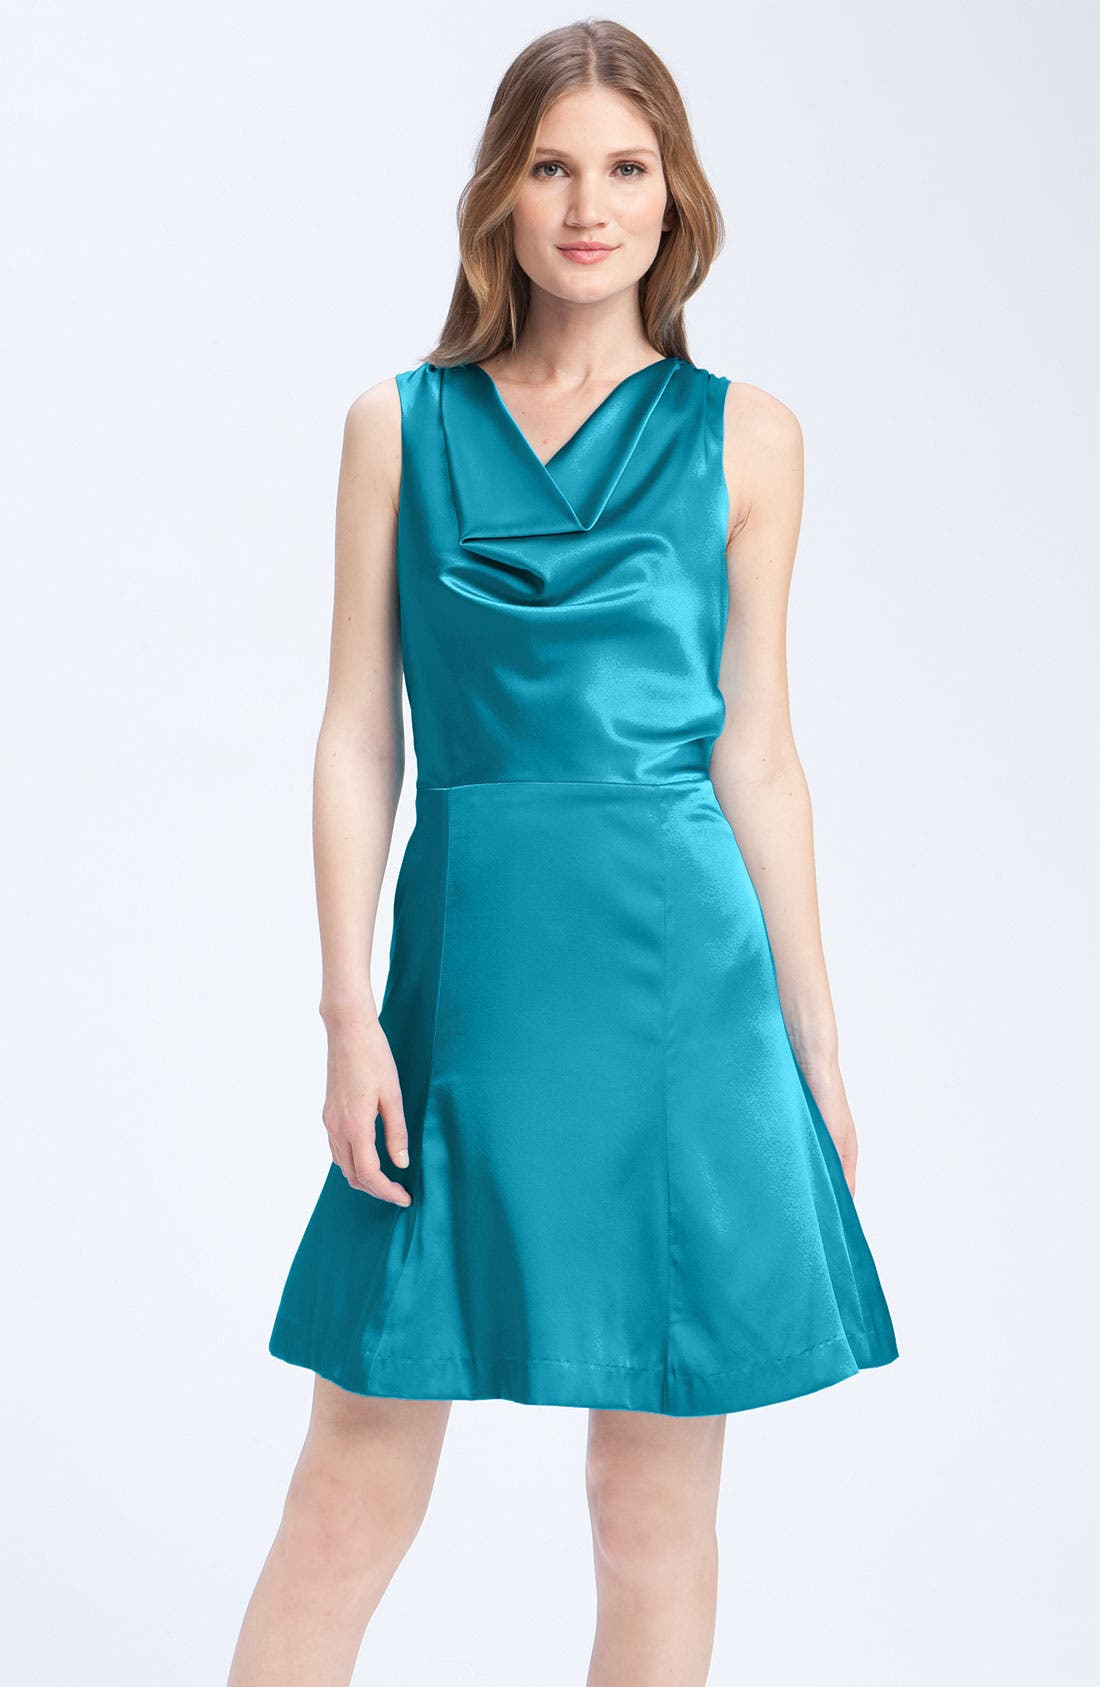 Alternate Image 1 Selected - Anna Elyse Bridesmaids Drape Neck Charmeuse Dress